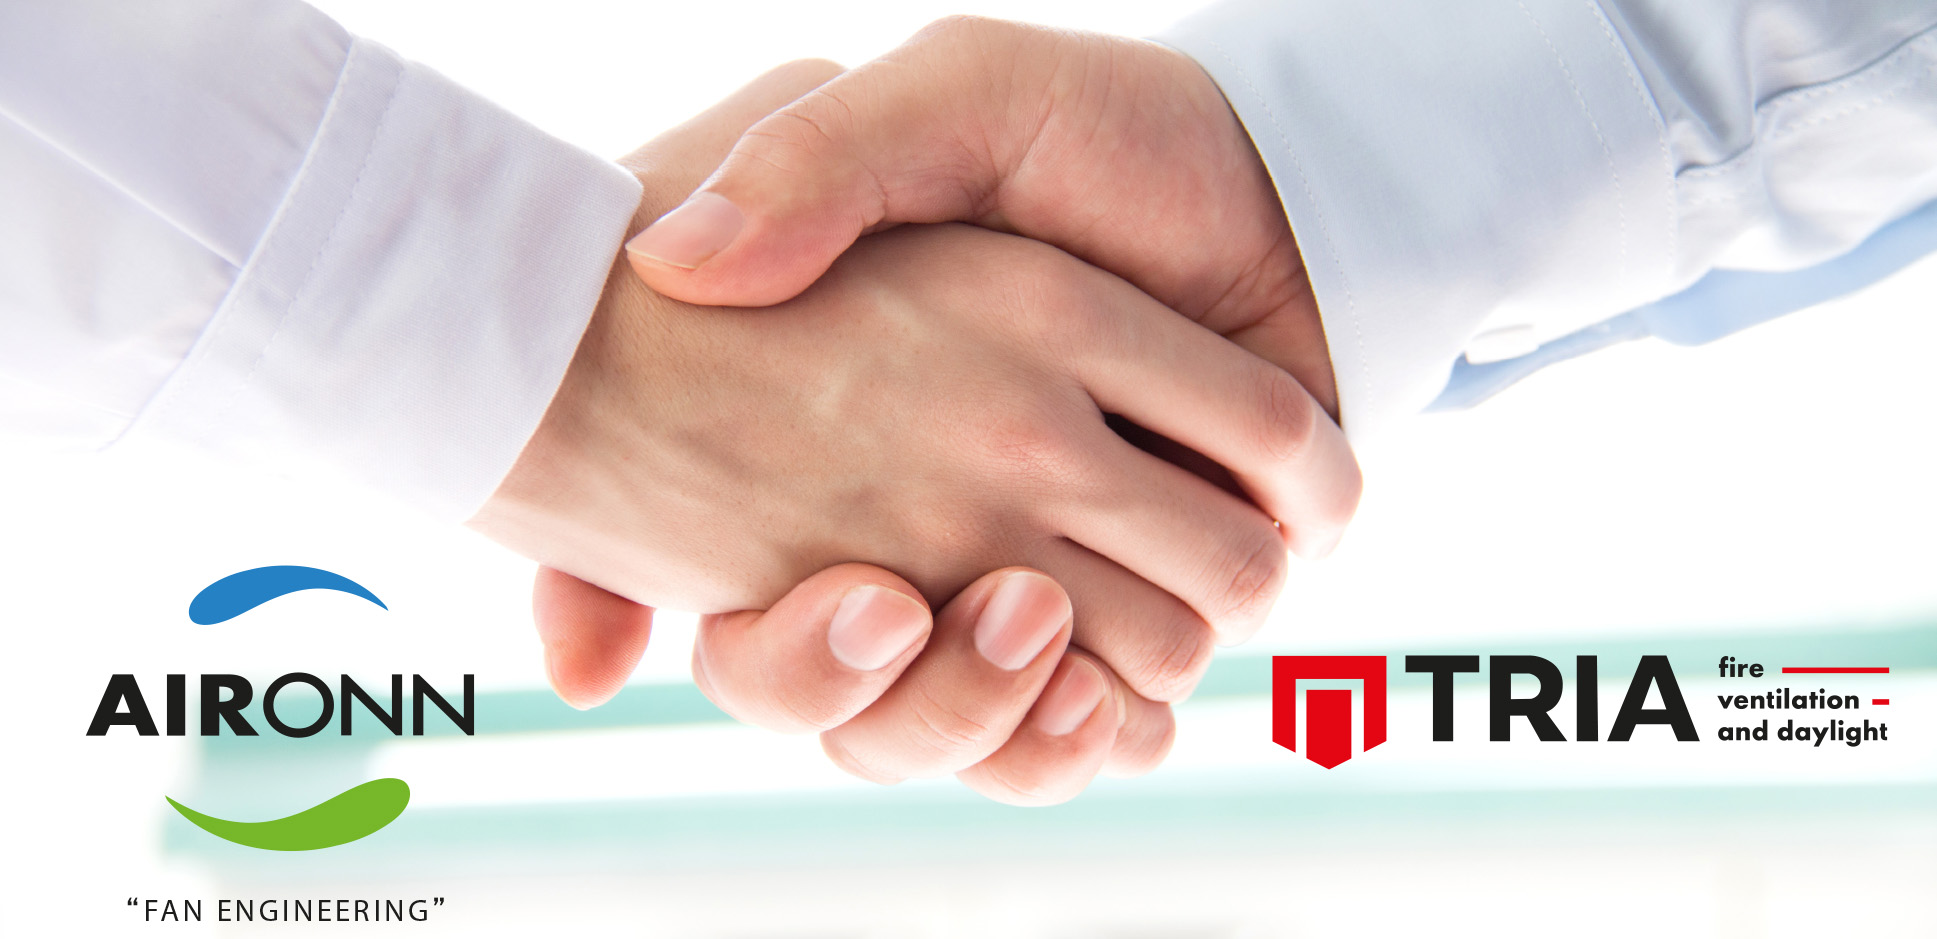 AİRONN A.Ş., TRIA International GmbH ile İşbirliği Anlaşması İmzaladı